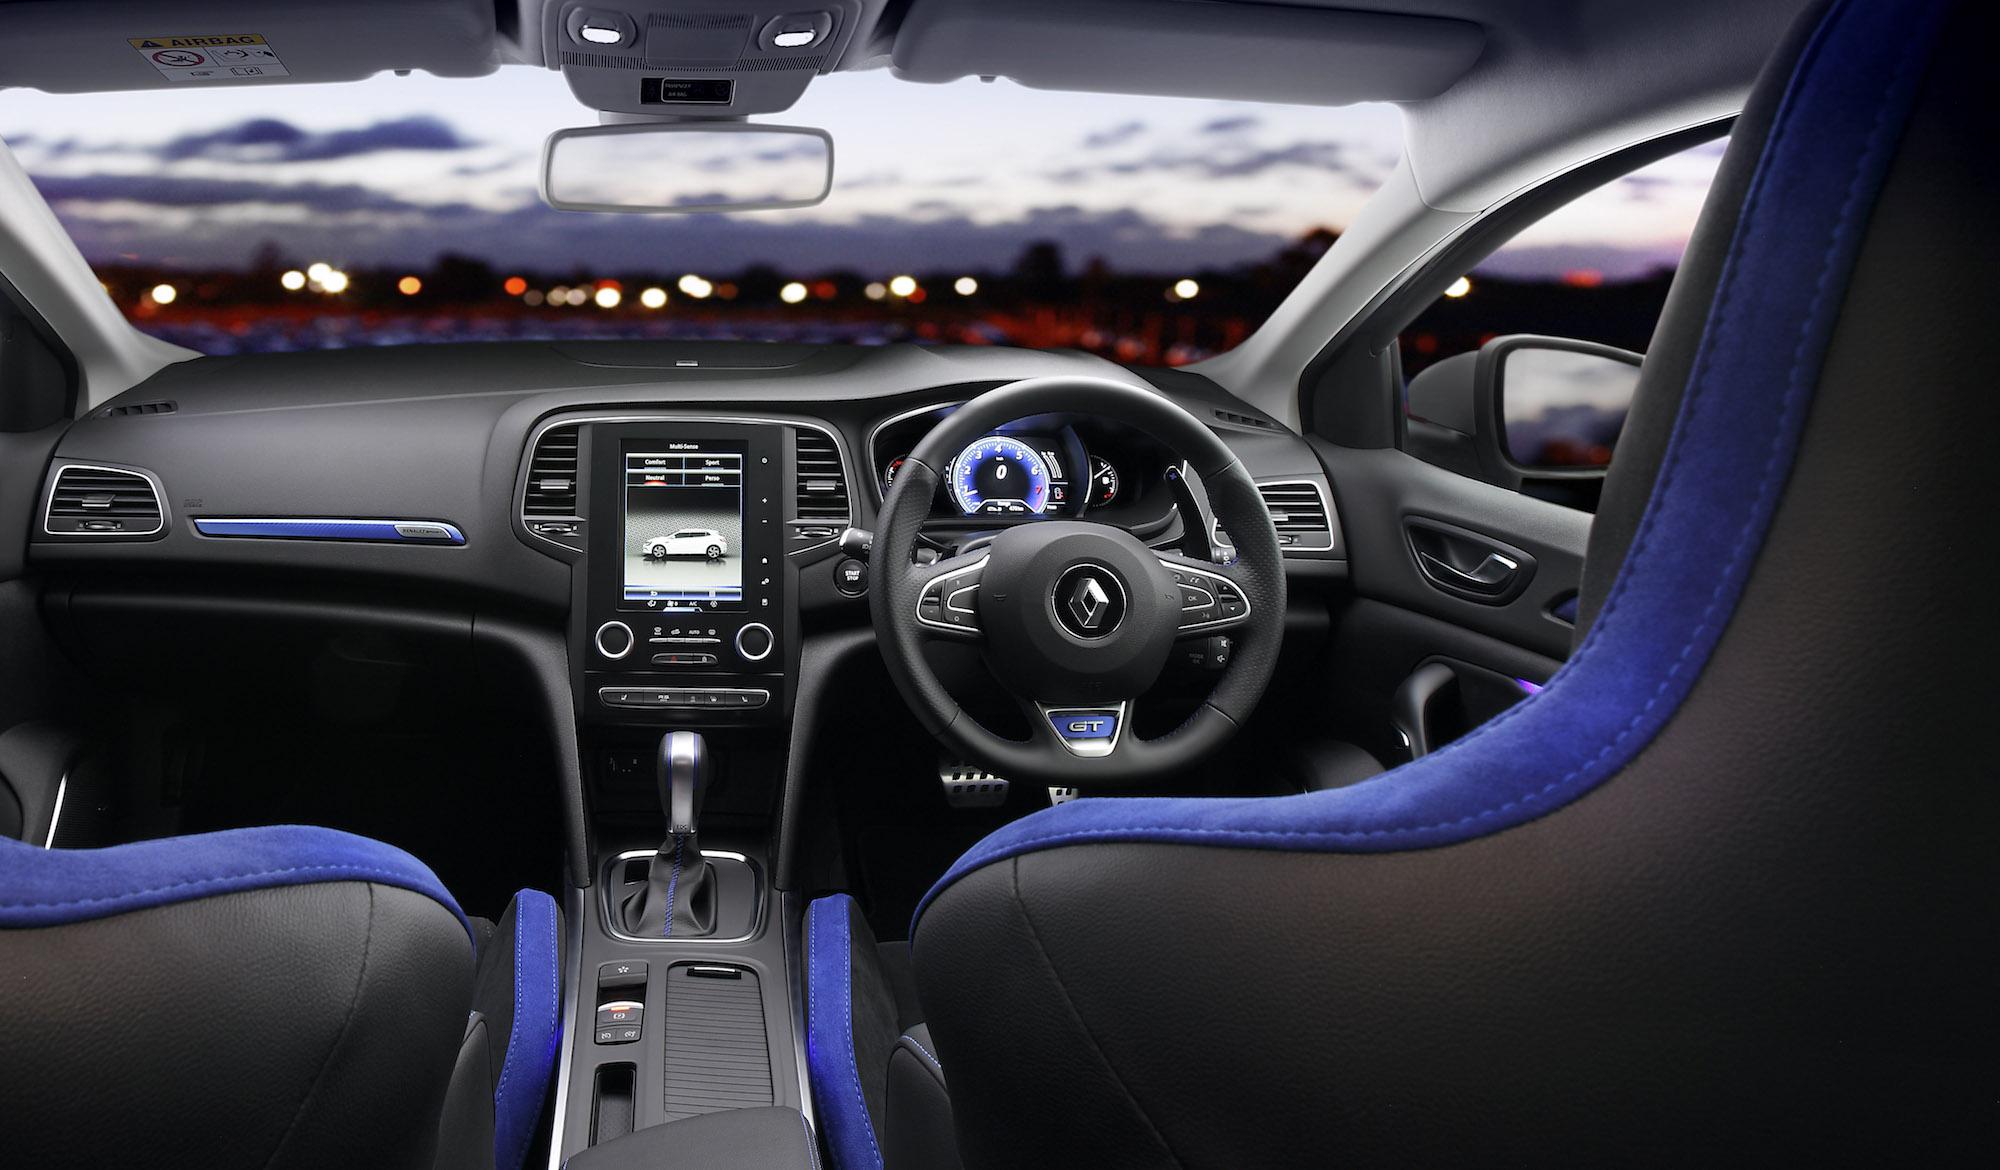 Renault Megane GT photo 170367